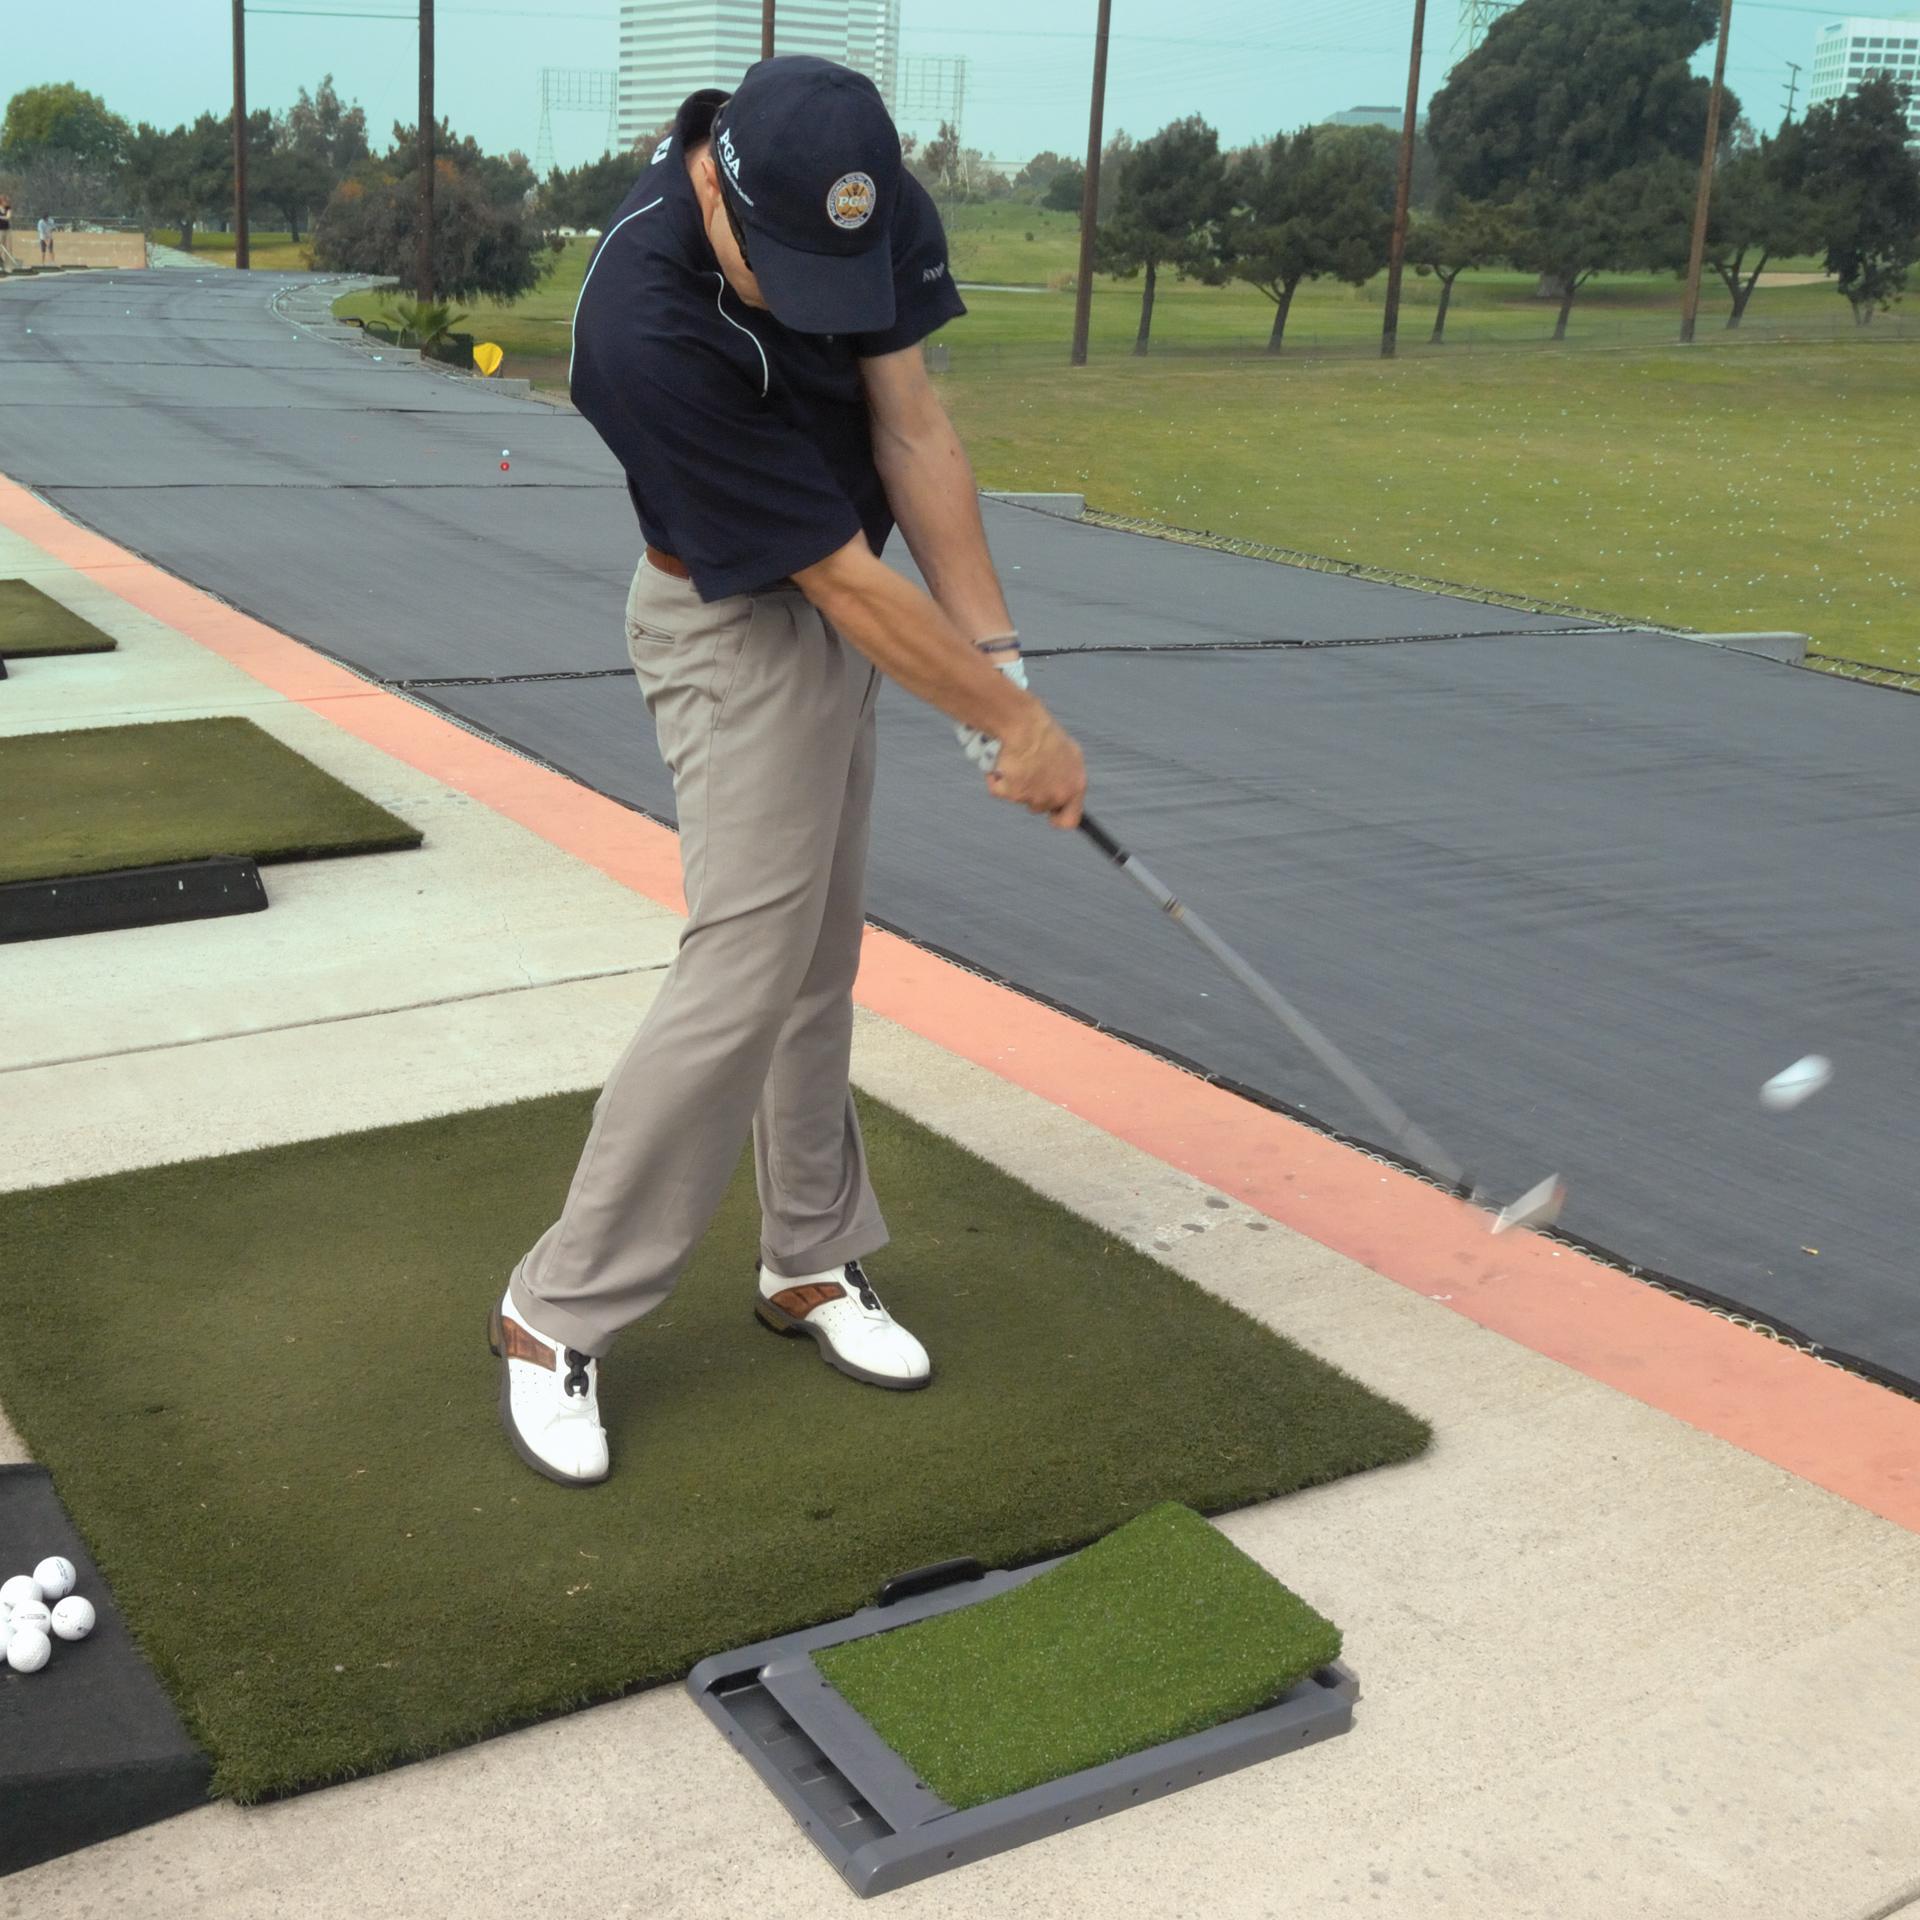 amazon com fairwaypro divot simulator golf mat golf hitting